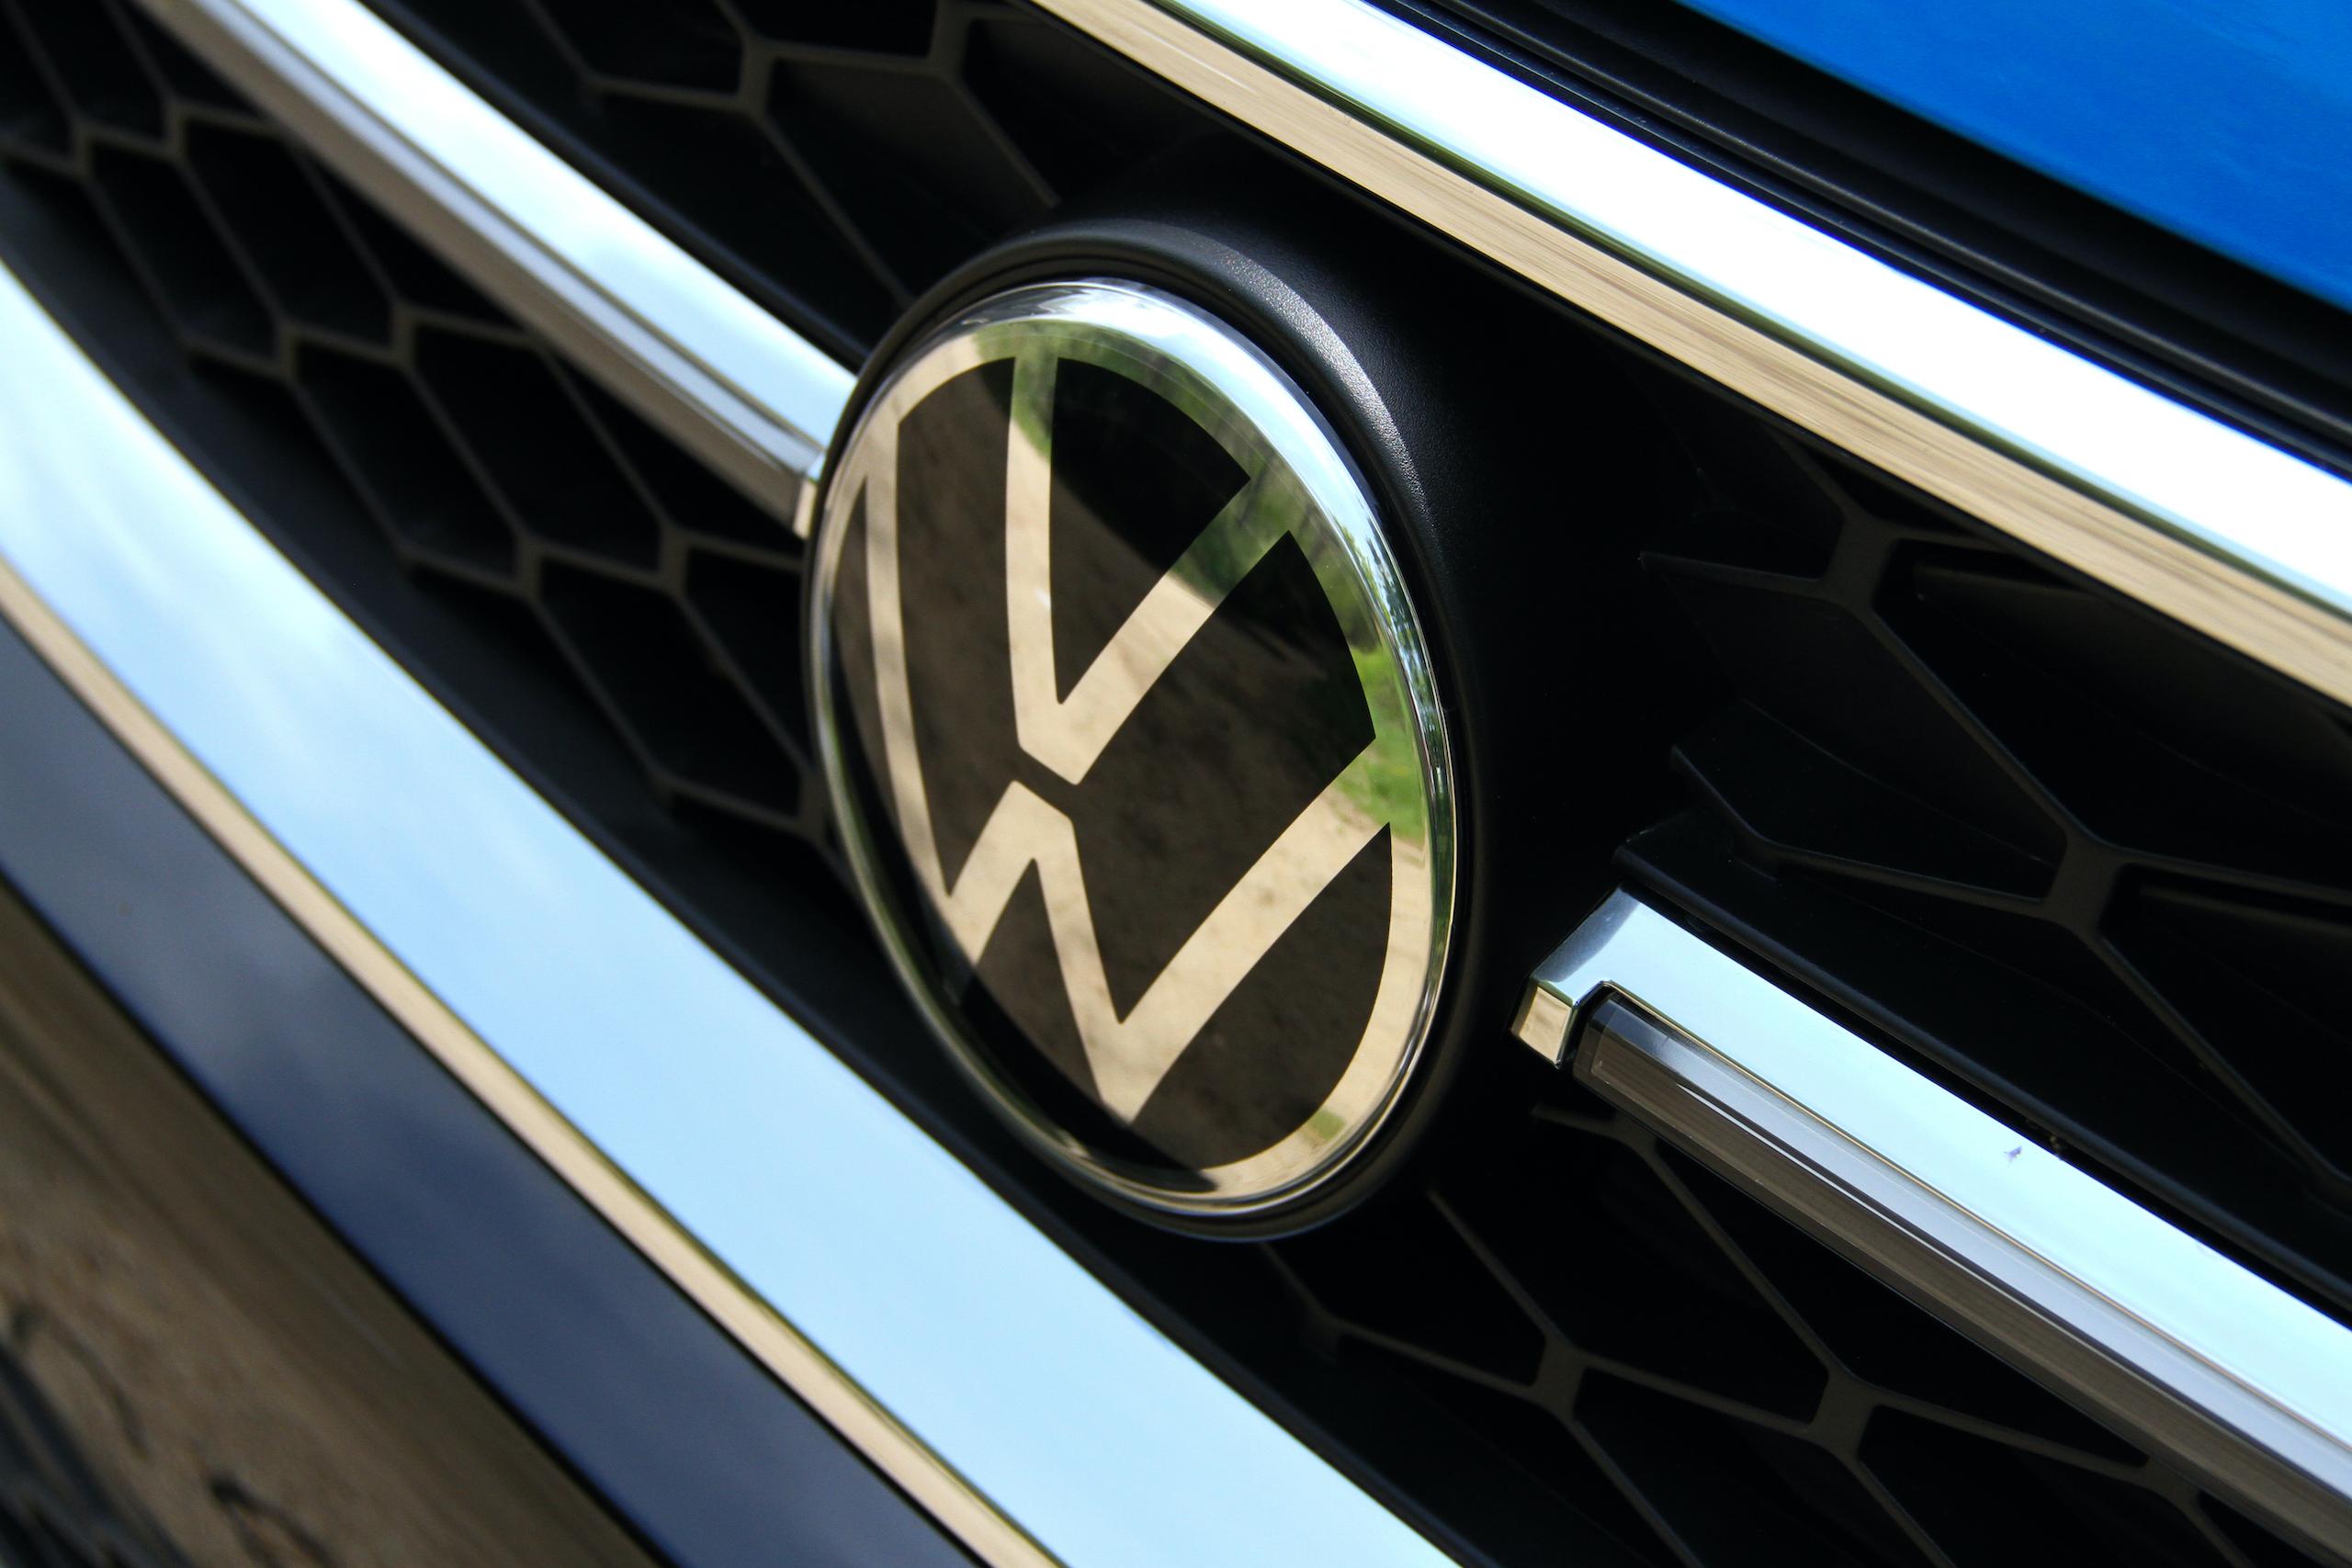 2022 Volkswagen Taos SEL grille badge